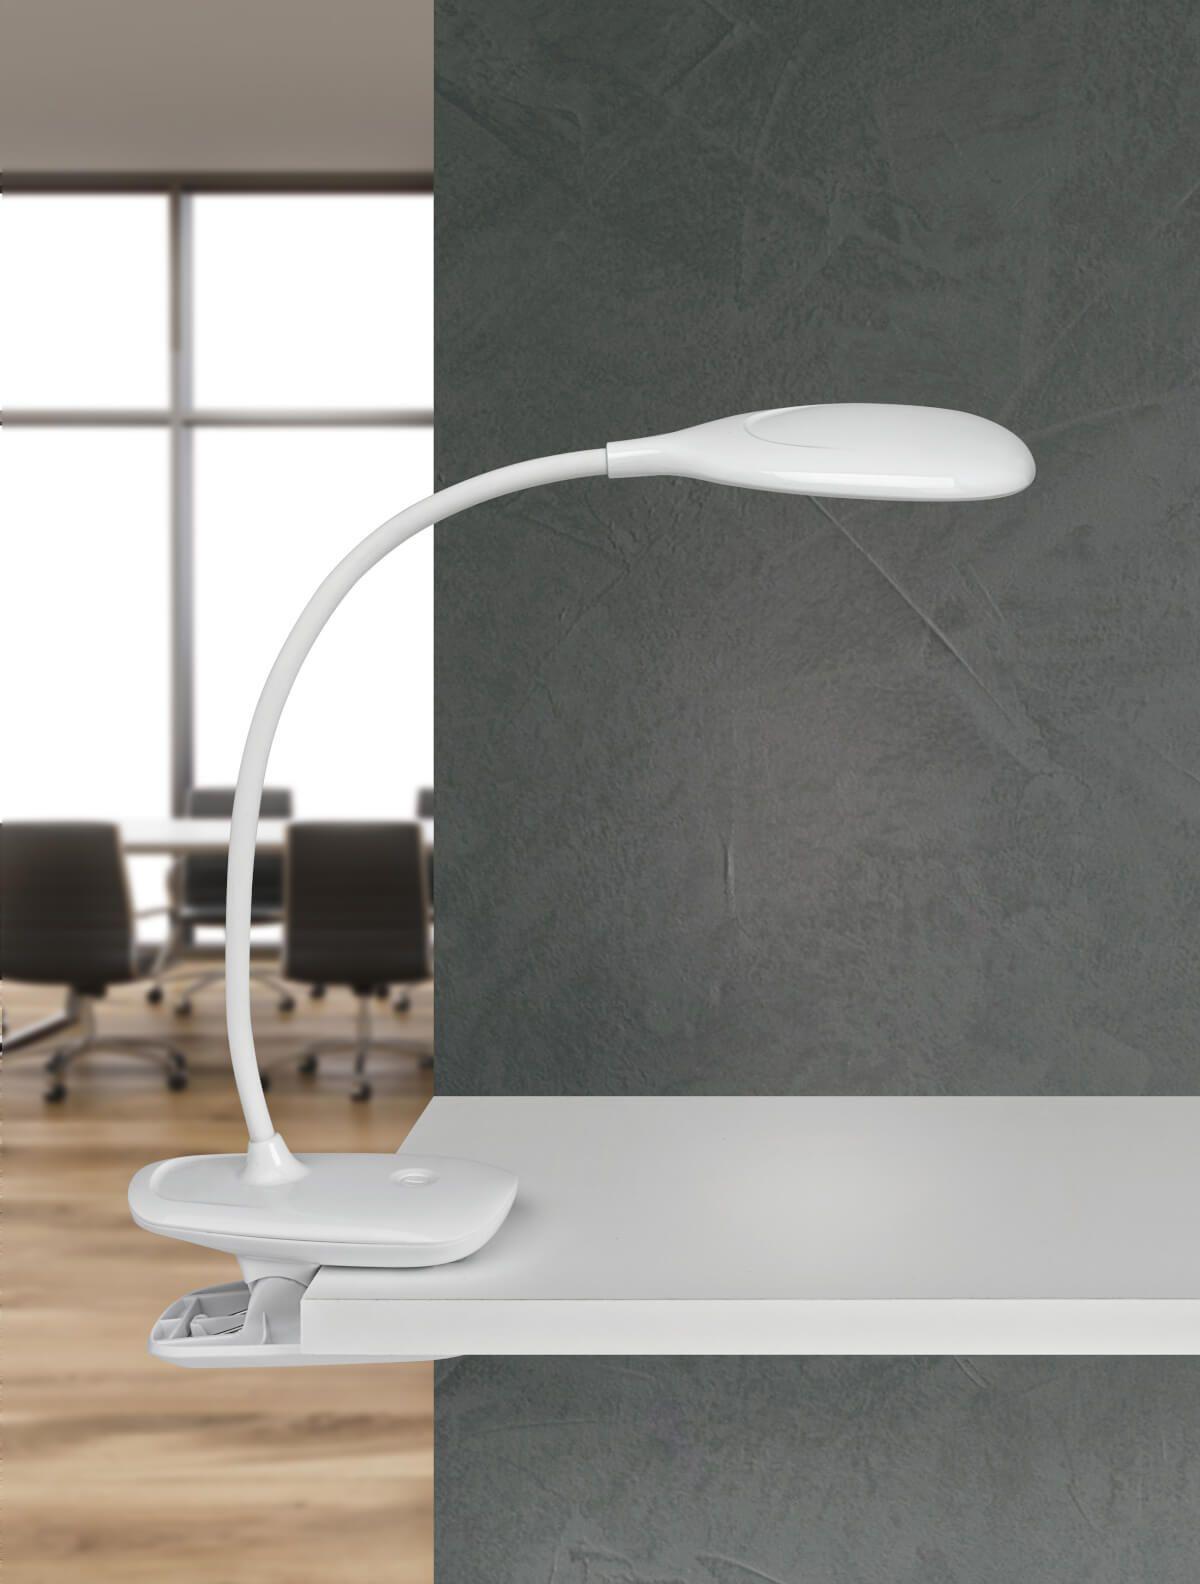 Akku Led Leuchte Mauljack Dimmbar Mit Bildern Led Leuchten Led Led Technik